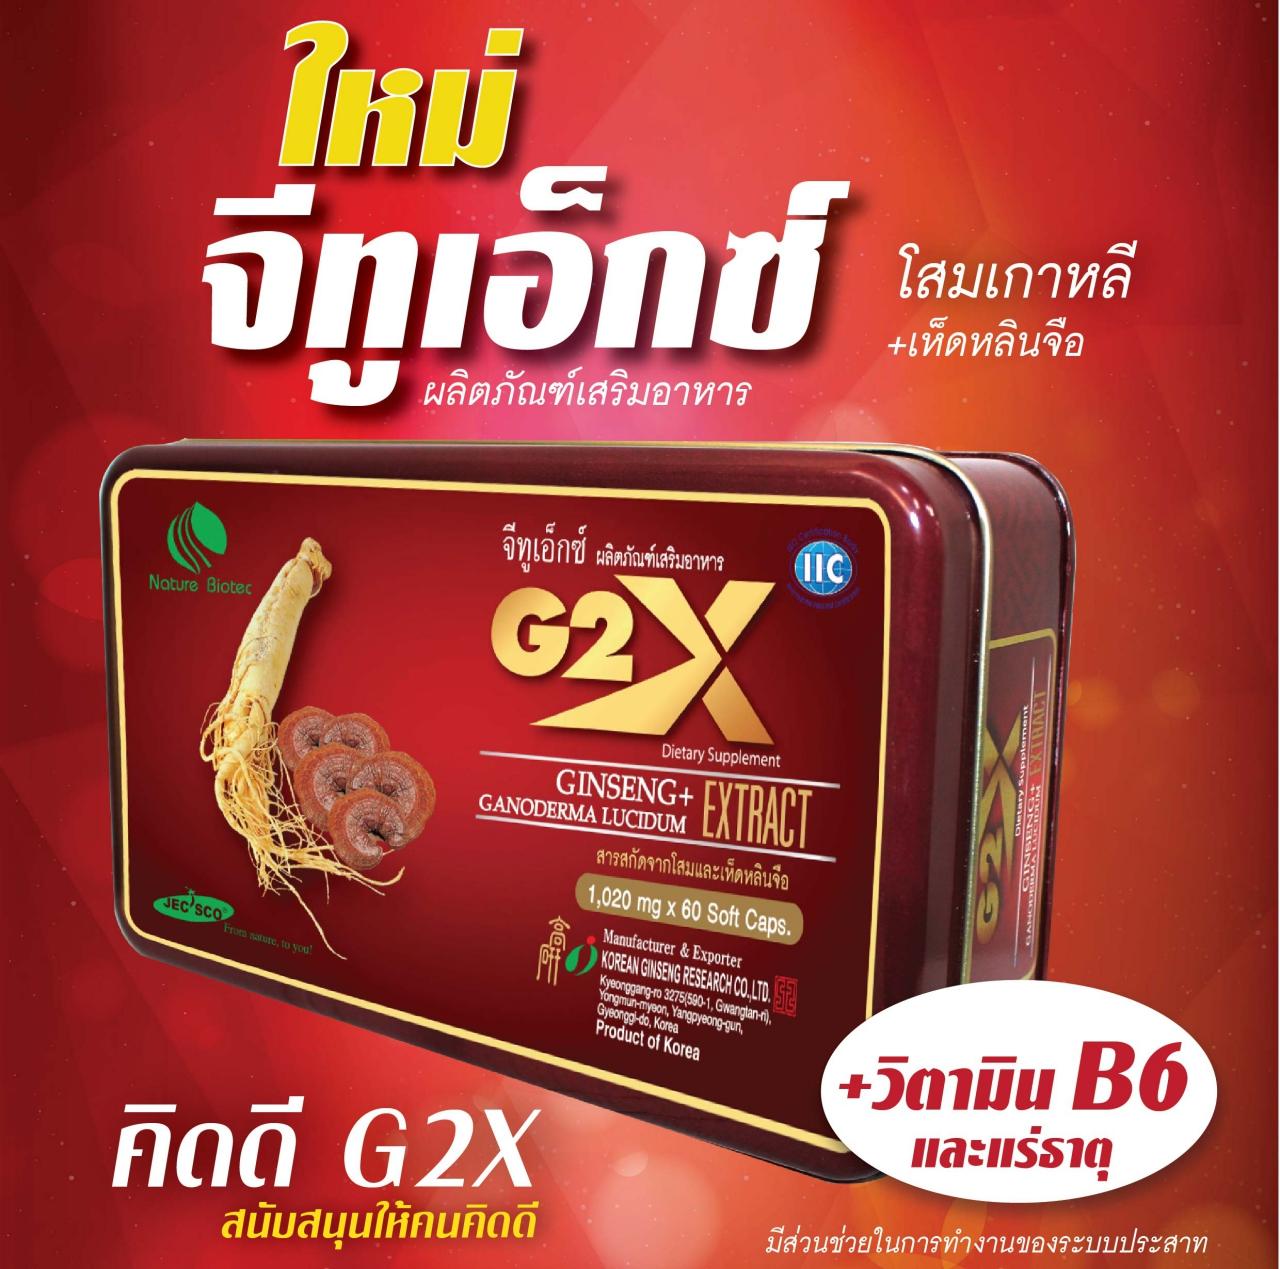 G2X Ginseng Ganoderma Lucidum Extract จีทูเอ็กซ์ (จินเซ็ง กาโนเดอร์ม่า ลูซิดั่ม เอ็กซ์แทรก) : สารสกัดจากโสมเกาหลี ผสานคุณประโยชน์ของ เห็ดหลินจือแดง วิตามินและแร่ธาตุ